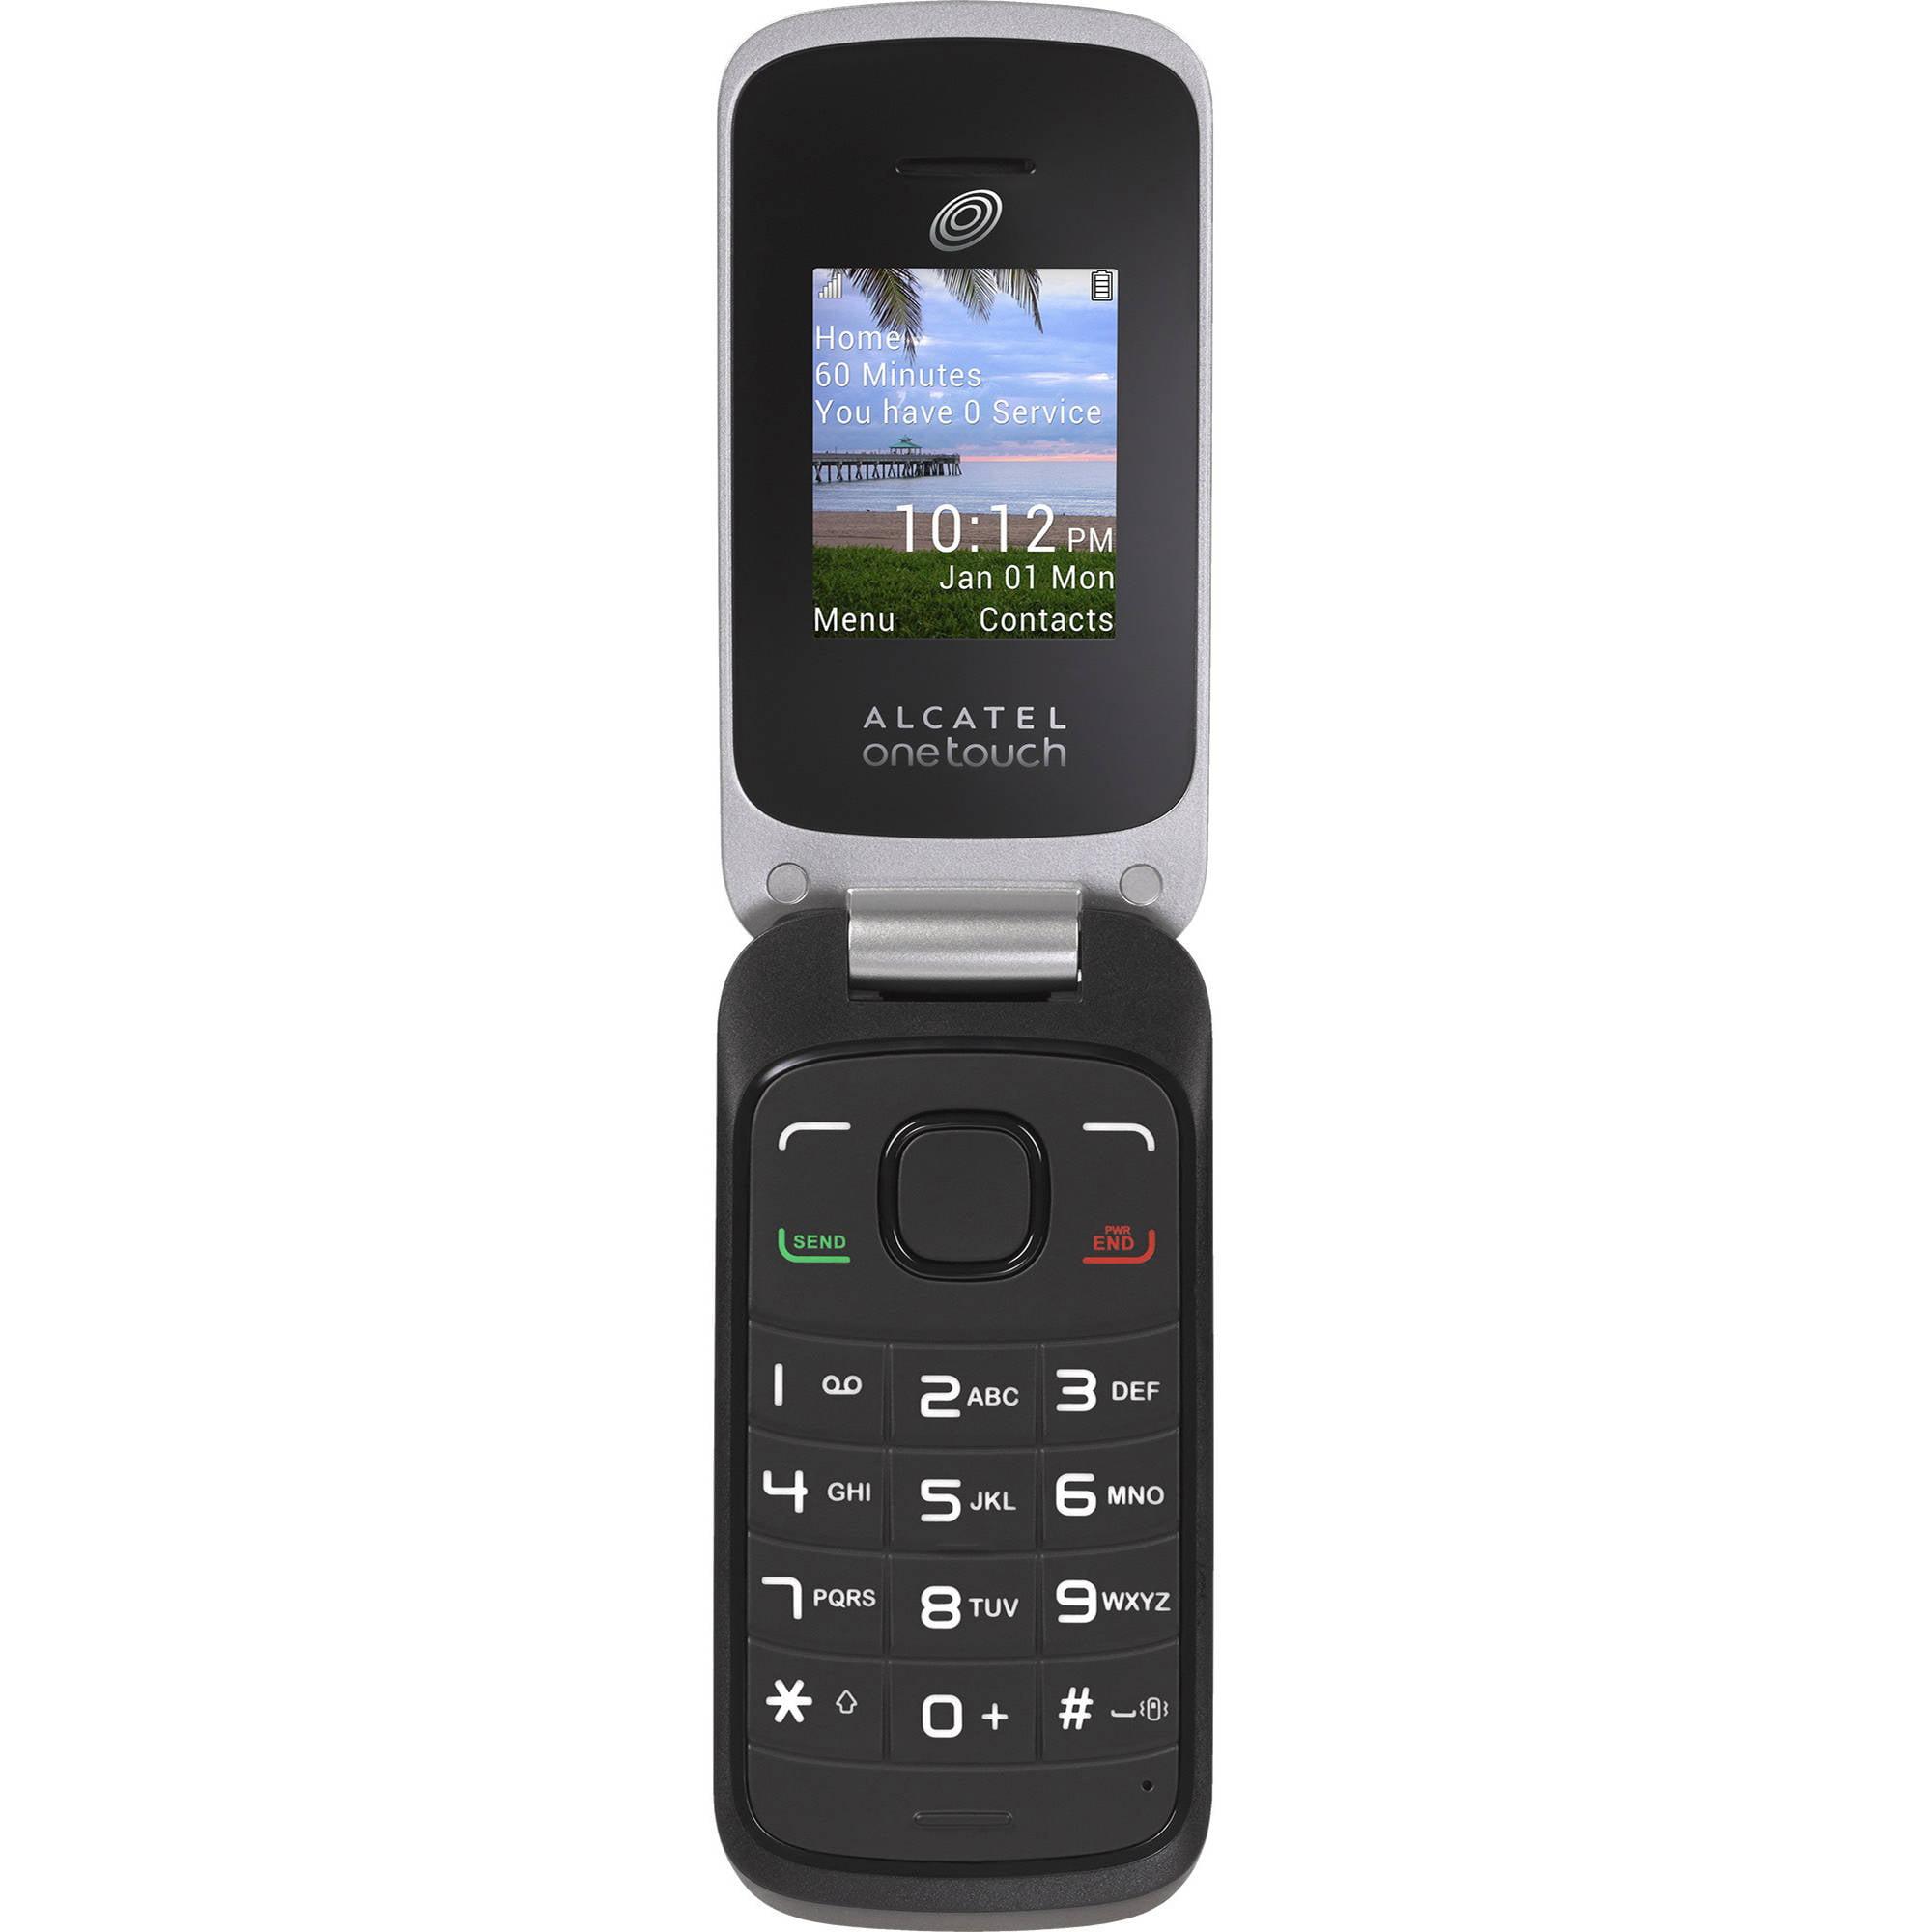 alcatel 382g manual browse manual guides u2022 rh centroamericaexpo com Verizon Samsung Flip Phone Manual Samsung Phone Operation Manual